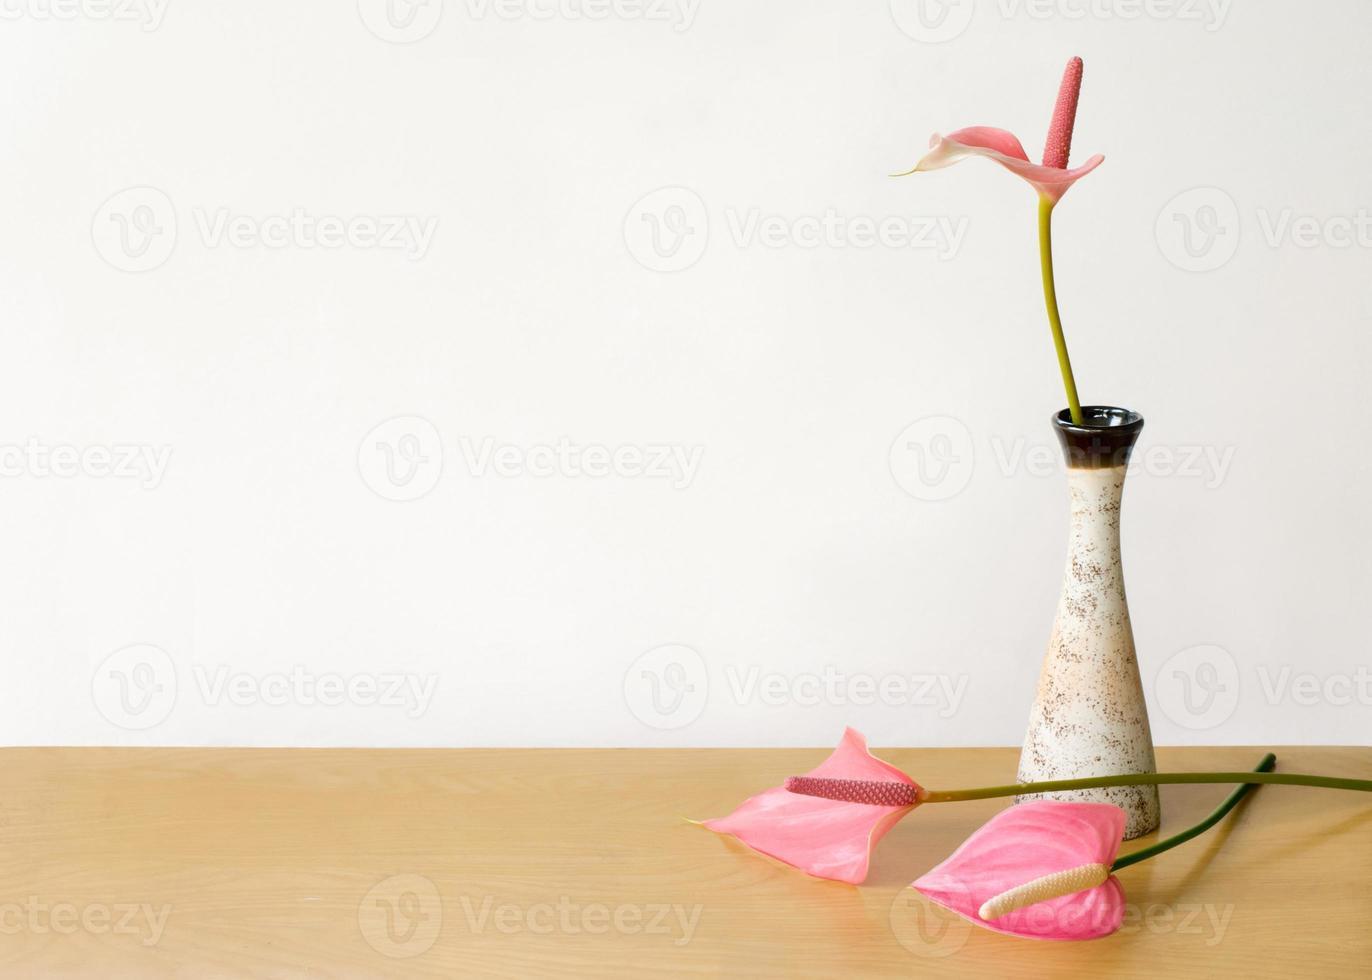 anthurium bloemenvaas foto